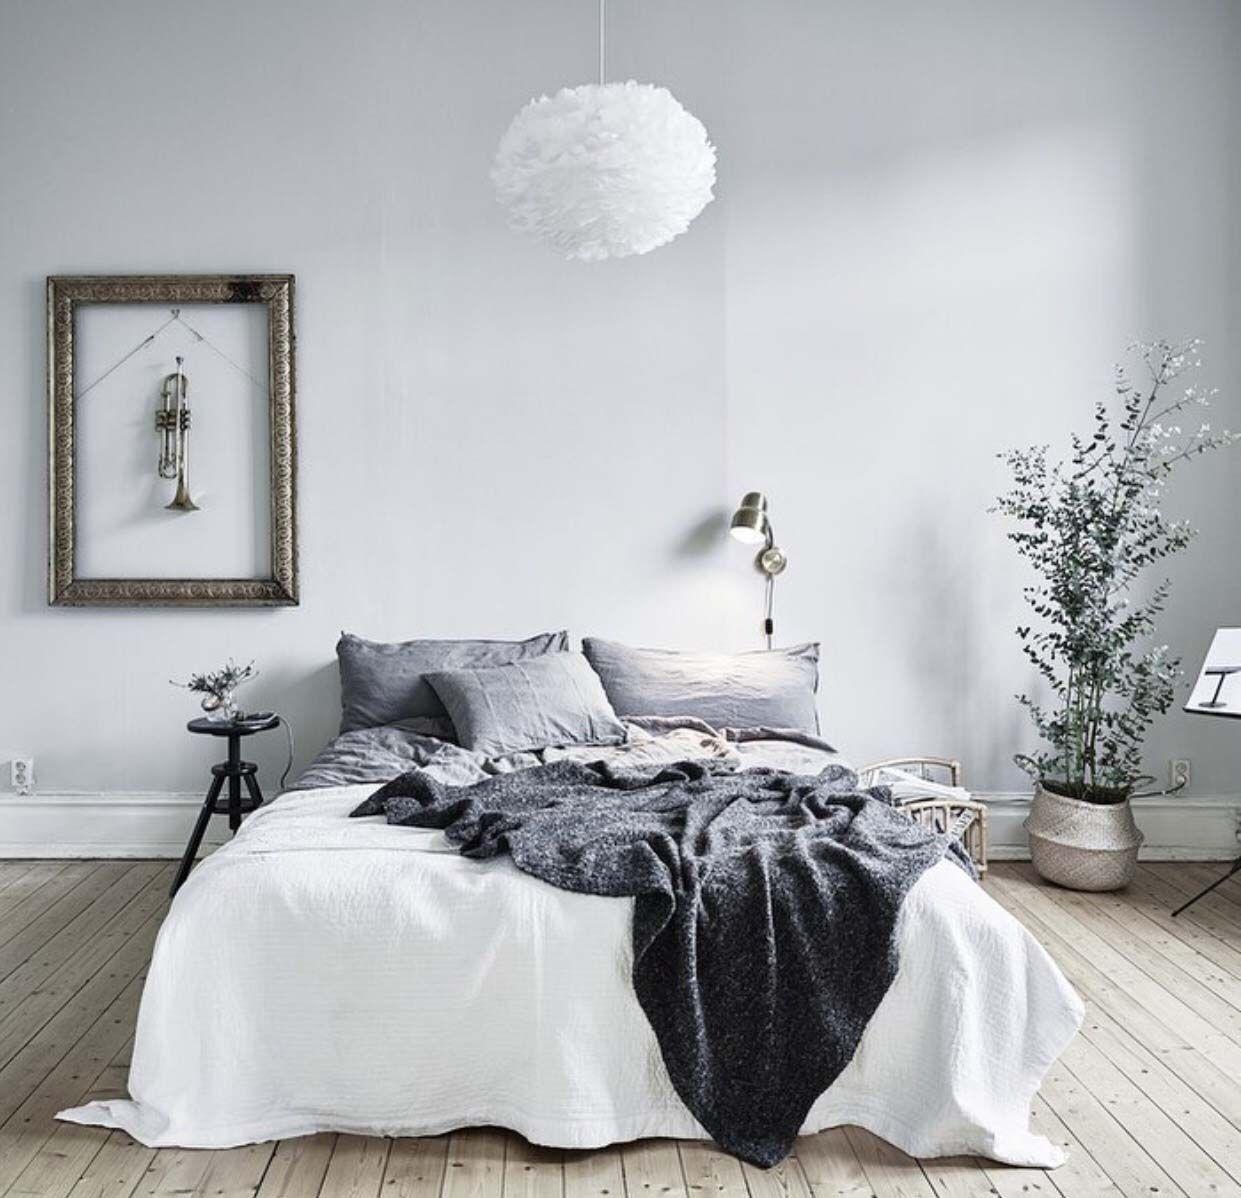 45 Scandinavian bedroom ideas that are modern and stylish45 Scandinavian bedroom ideas that are modern and stylish  . Scandinavian Bedrooms Pinterest. Home Design Ideas